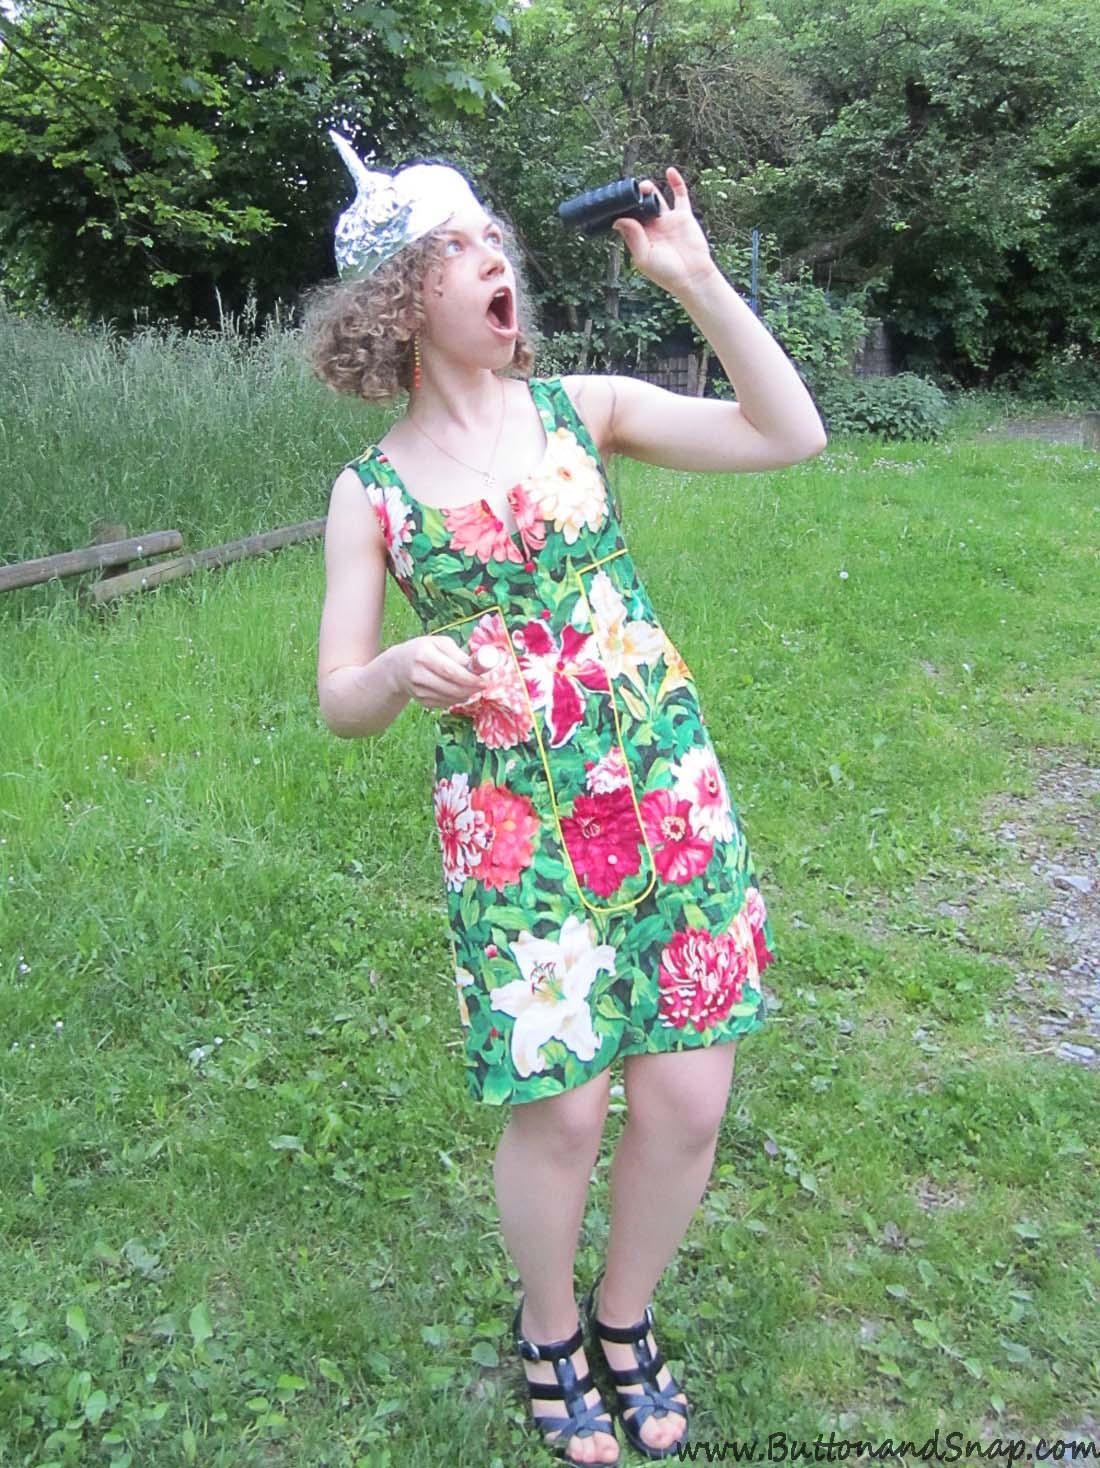 Spying a UFO dress